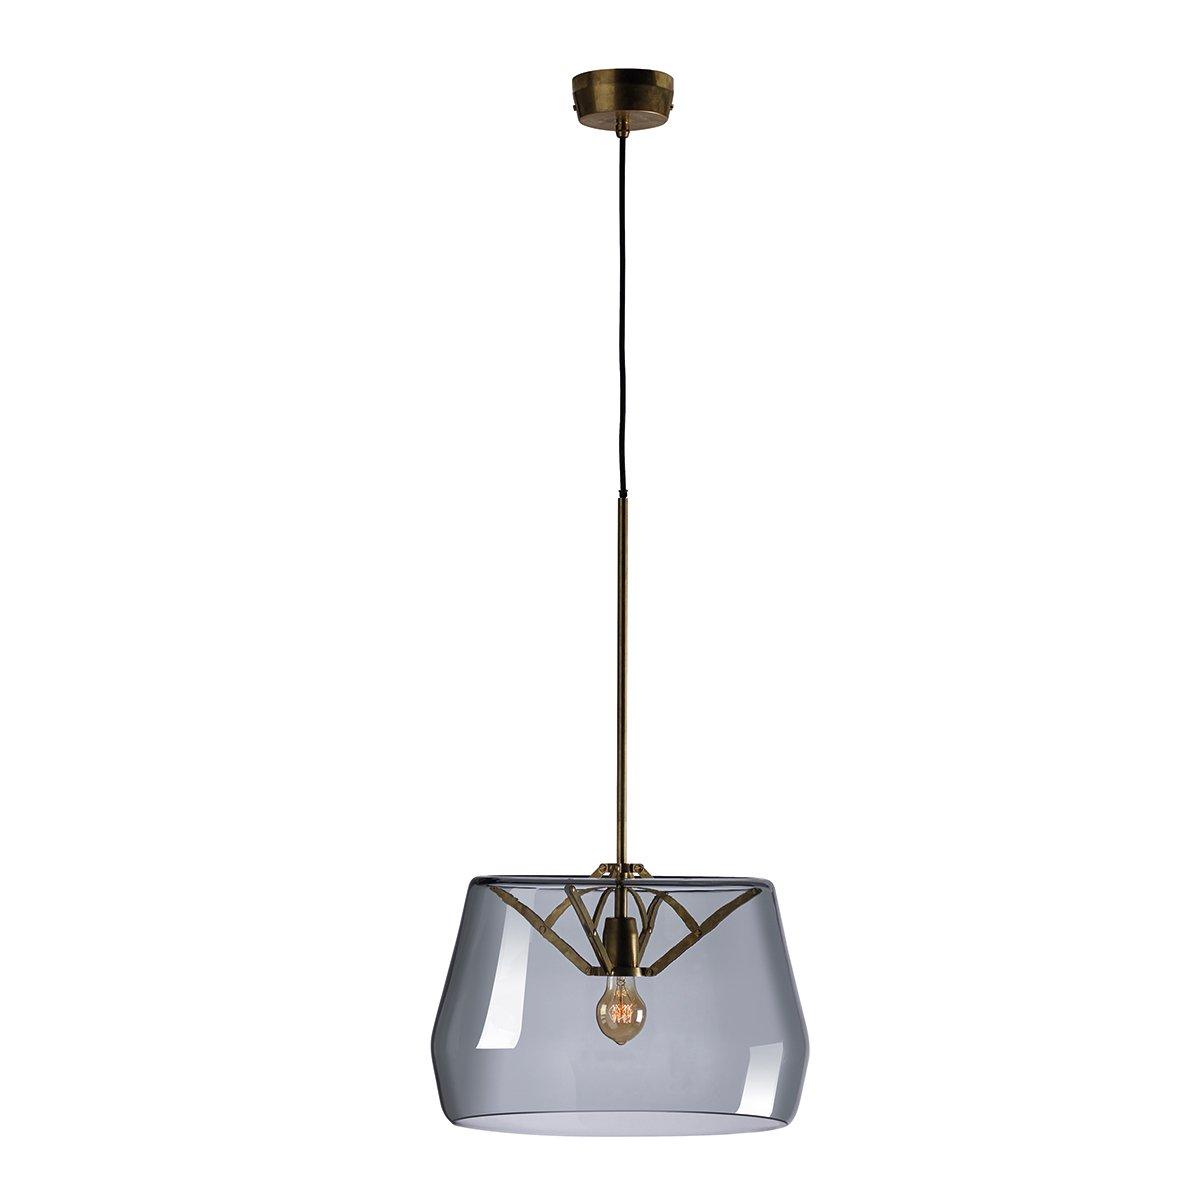 Tonone Atlas Hanglamp - Grijs �45 cm.